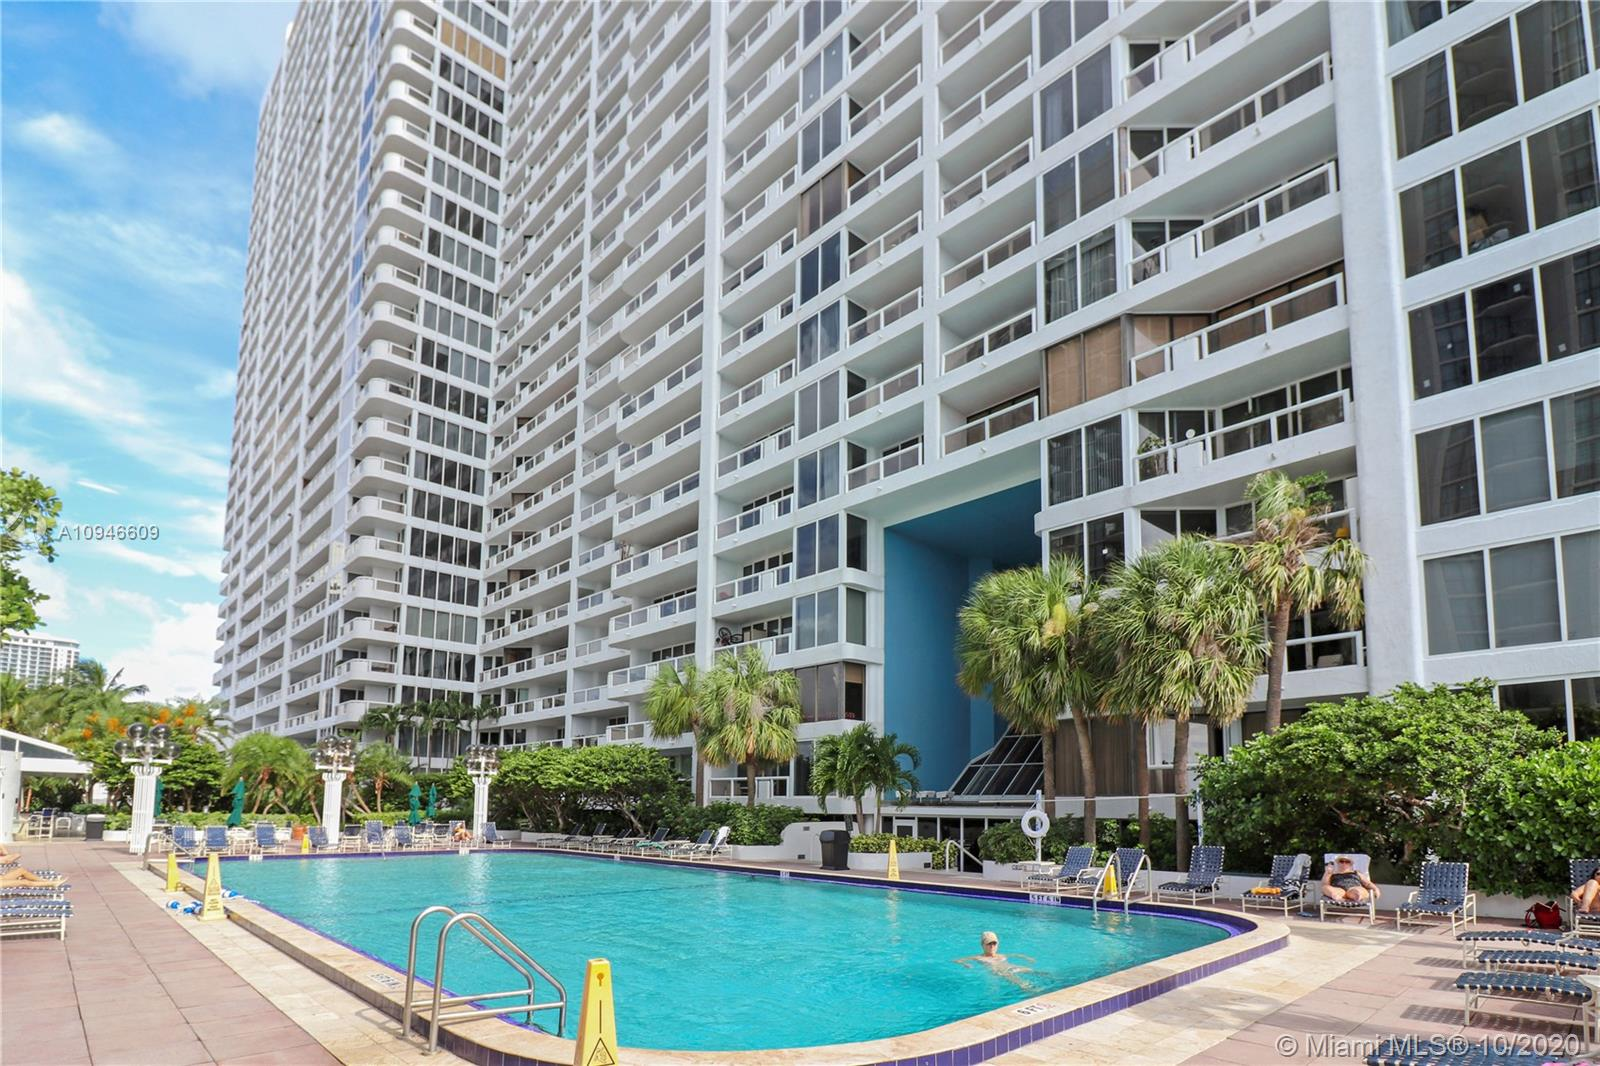 1717 N Bayshore Dr # 3241, Miami, Florida 33132, 3 Bedrooms Bedrooms, ,2 BathroomsBathrooms,Residential,For Sale,1717 N Bayshore Dr # 3241,A10946609